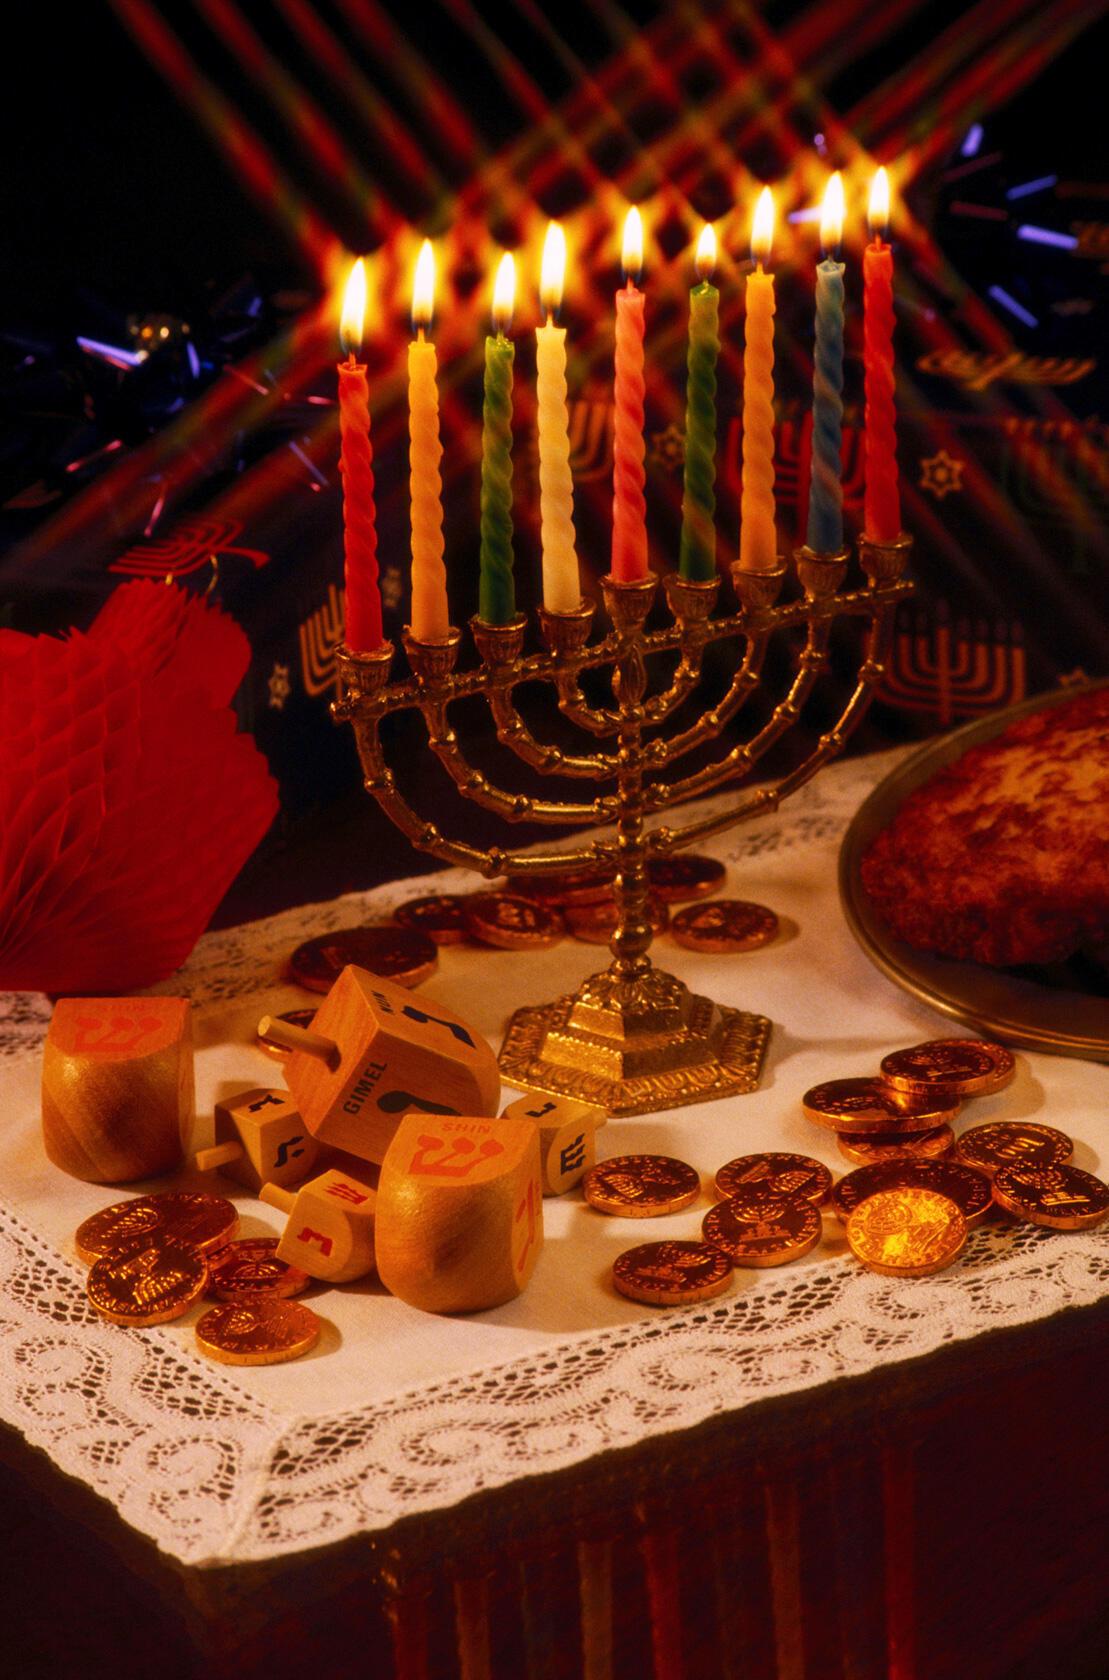 Menorah for Hanukkah